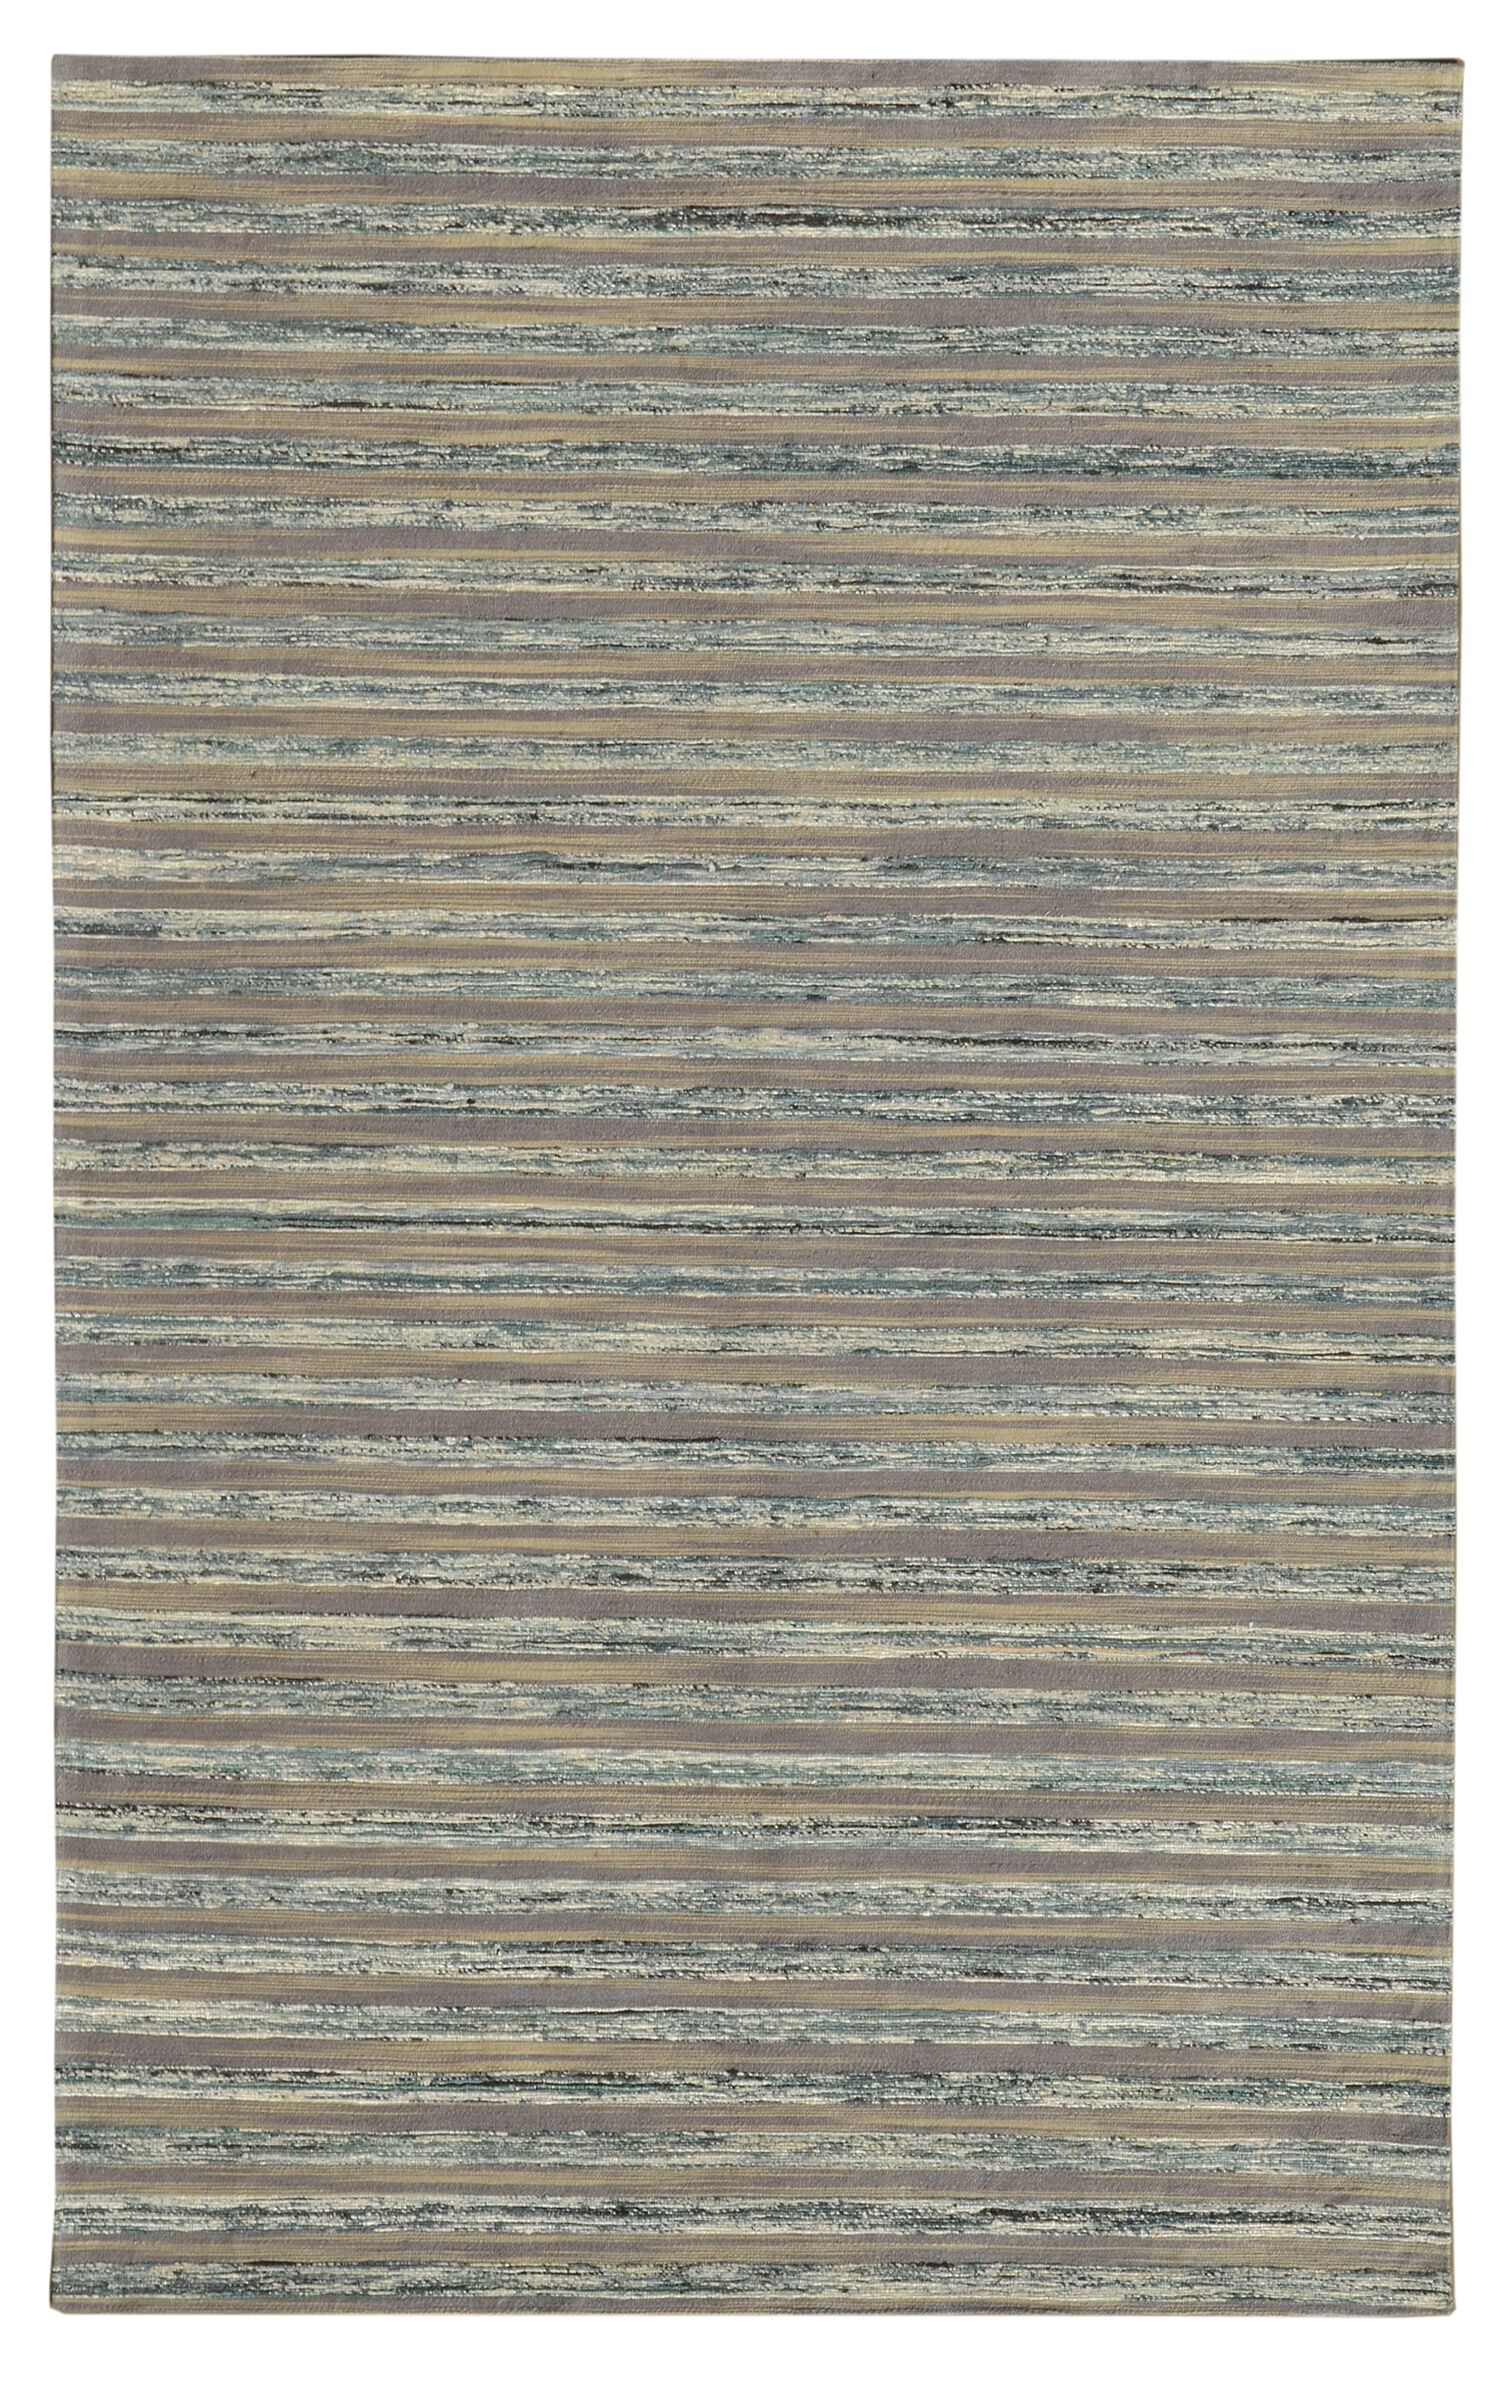 Lazzarro Gray Area Rug Rug Size: 5' x 7'6